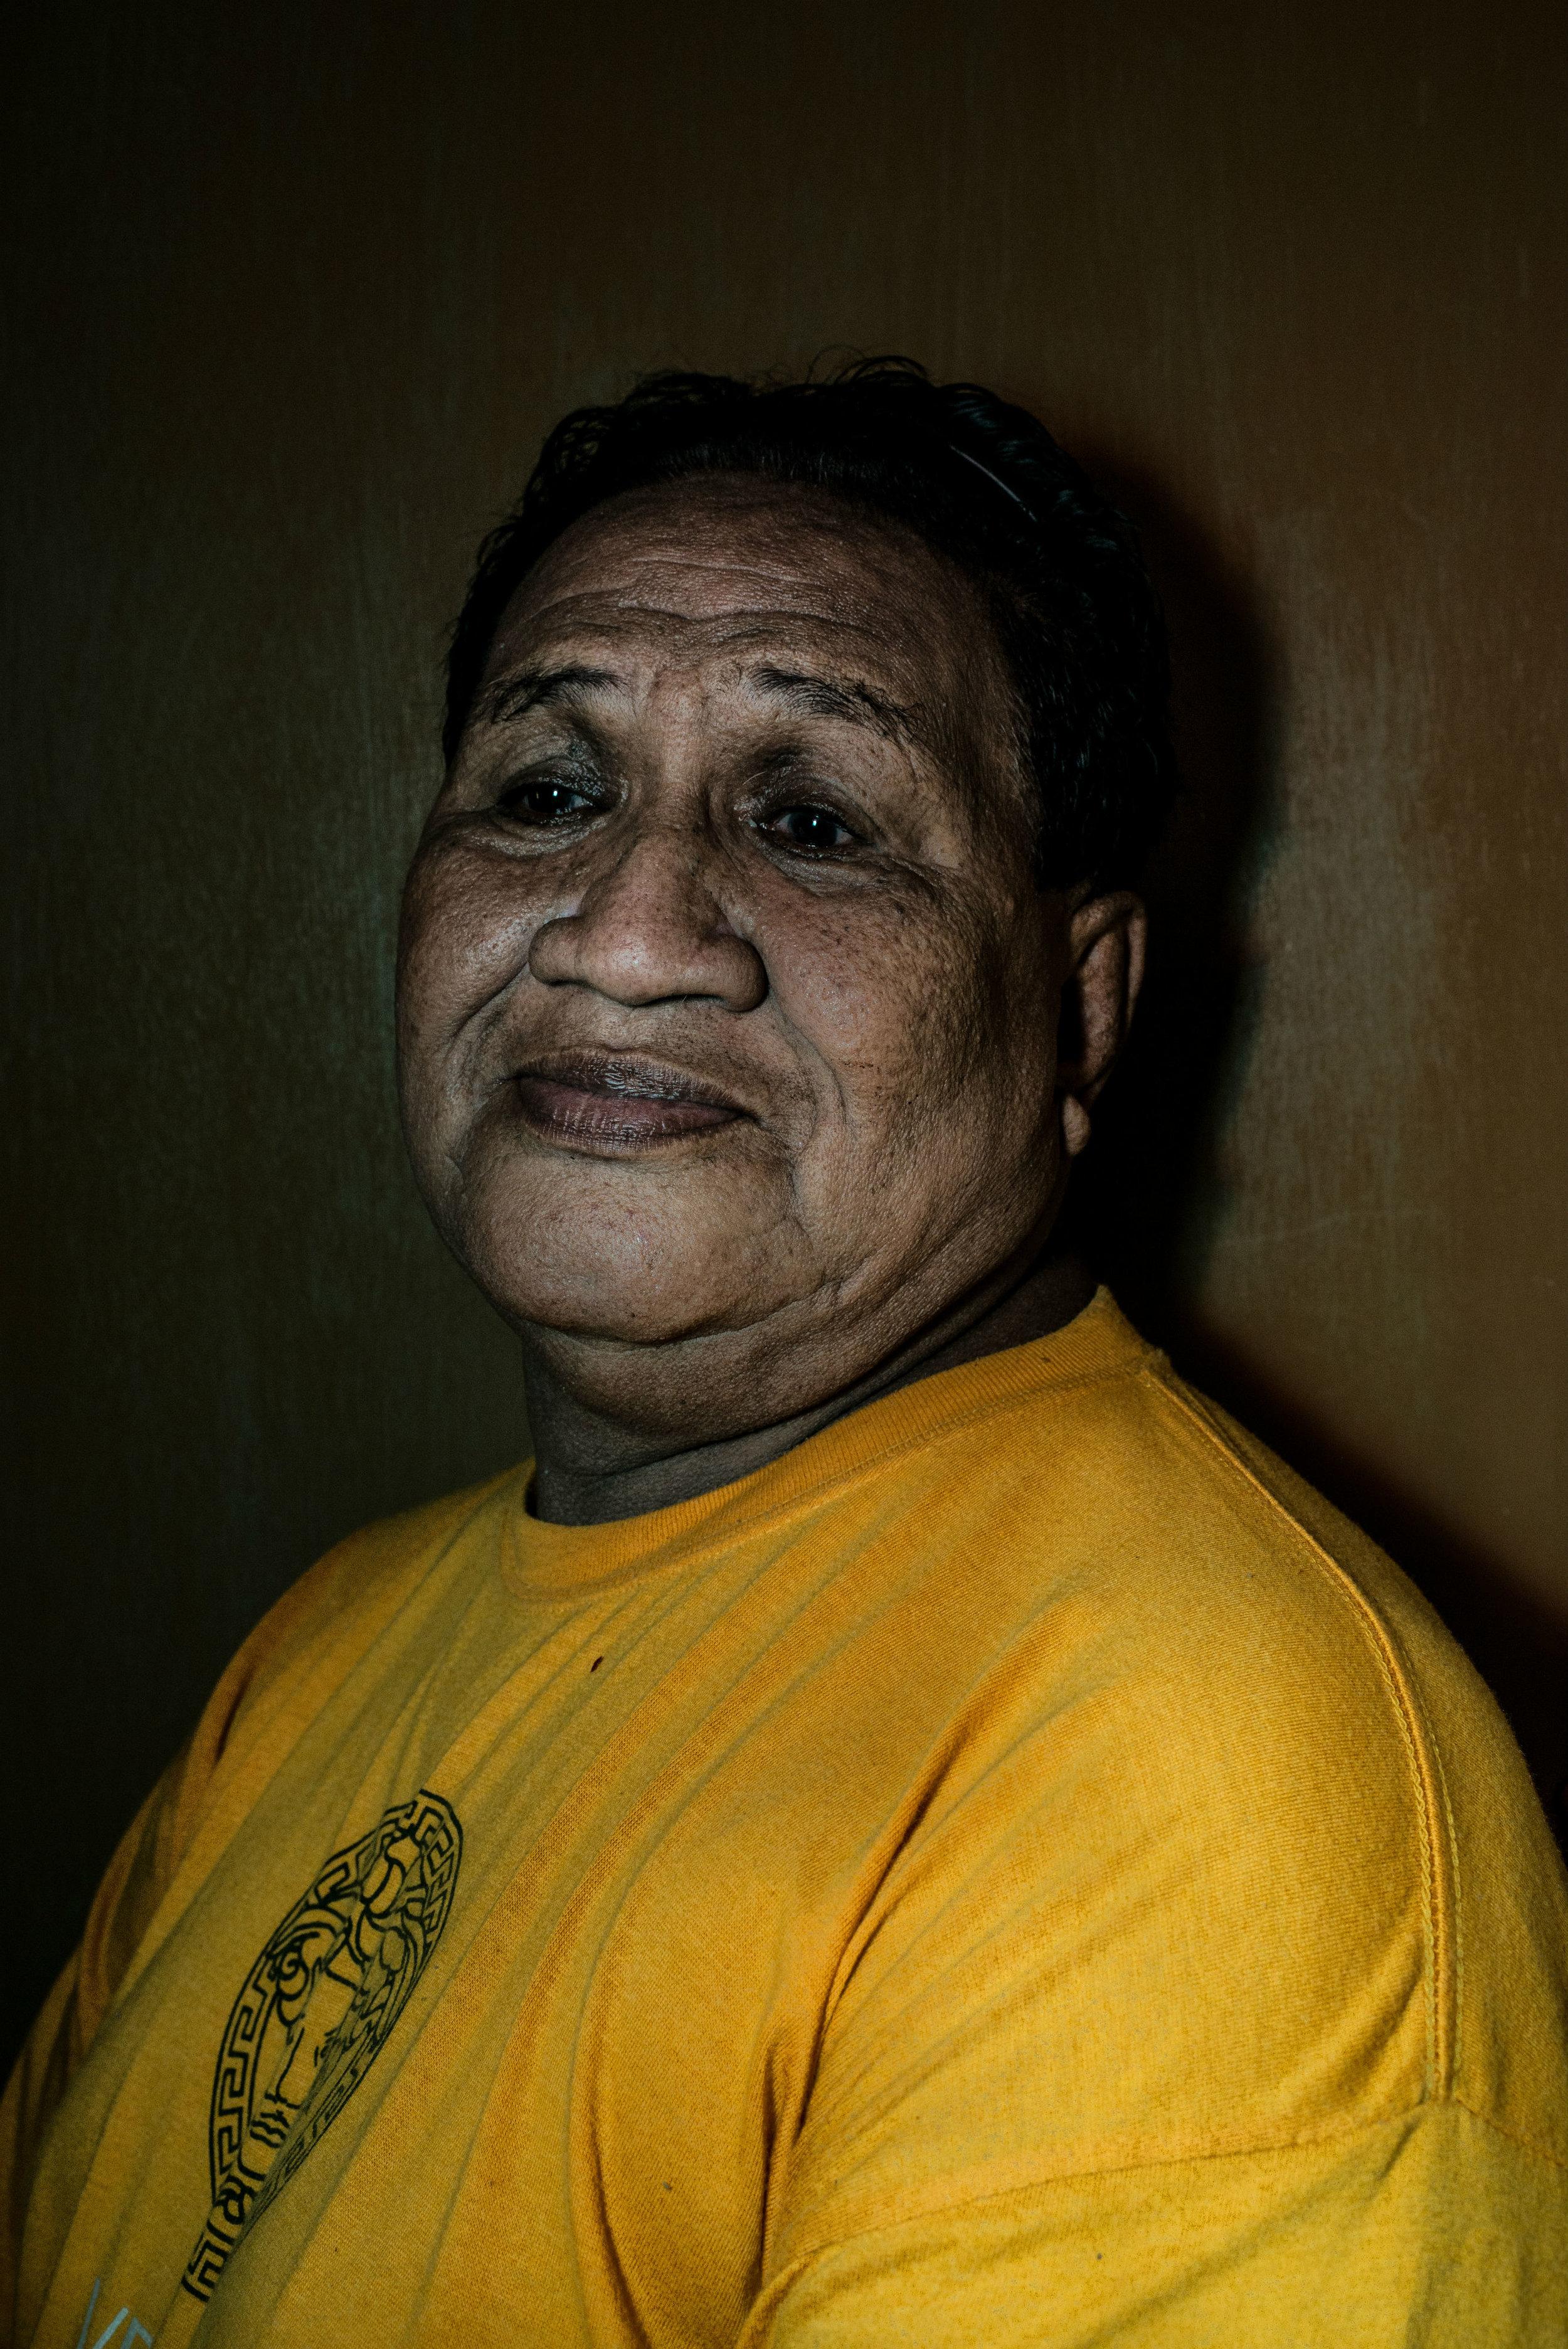 Yoti, 81 years old. Jakarta, 2013.